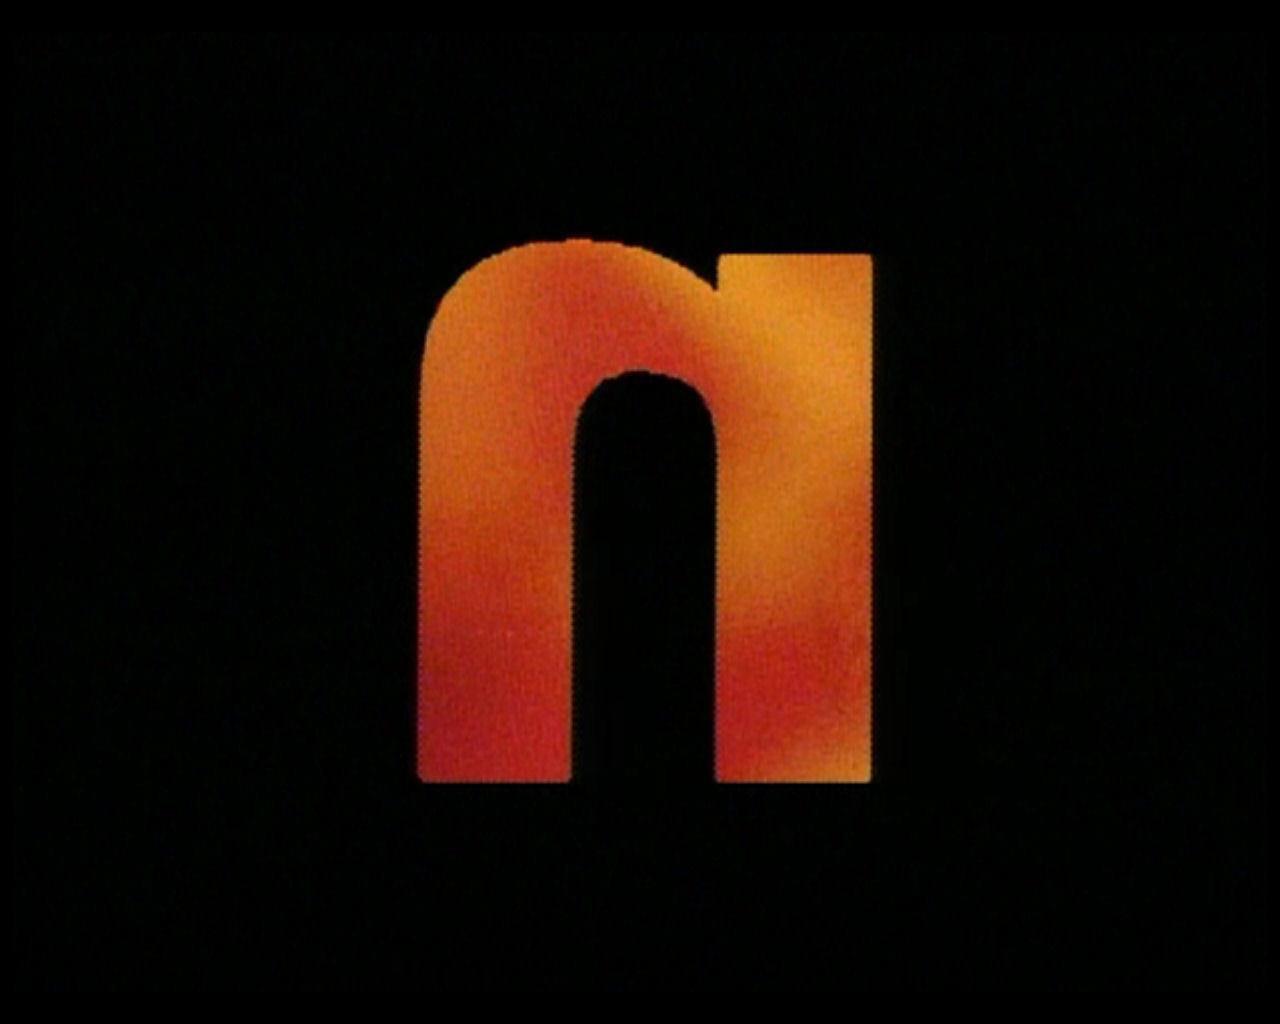 nin logo from broken movie nine inch nails image